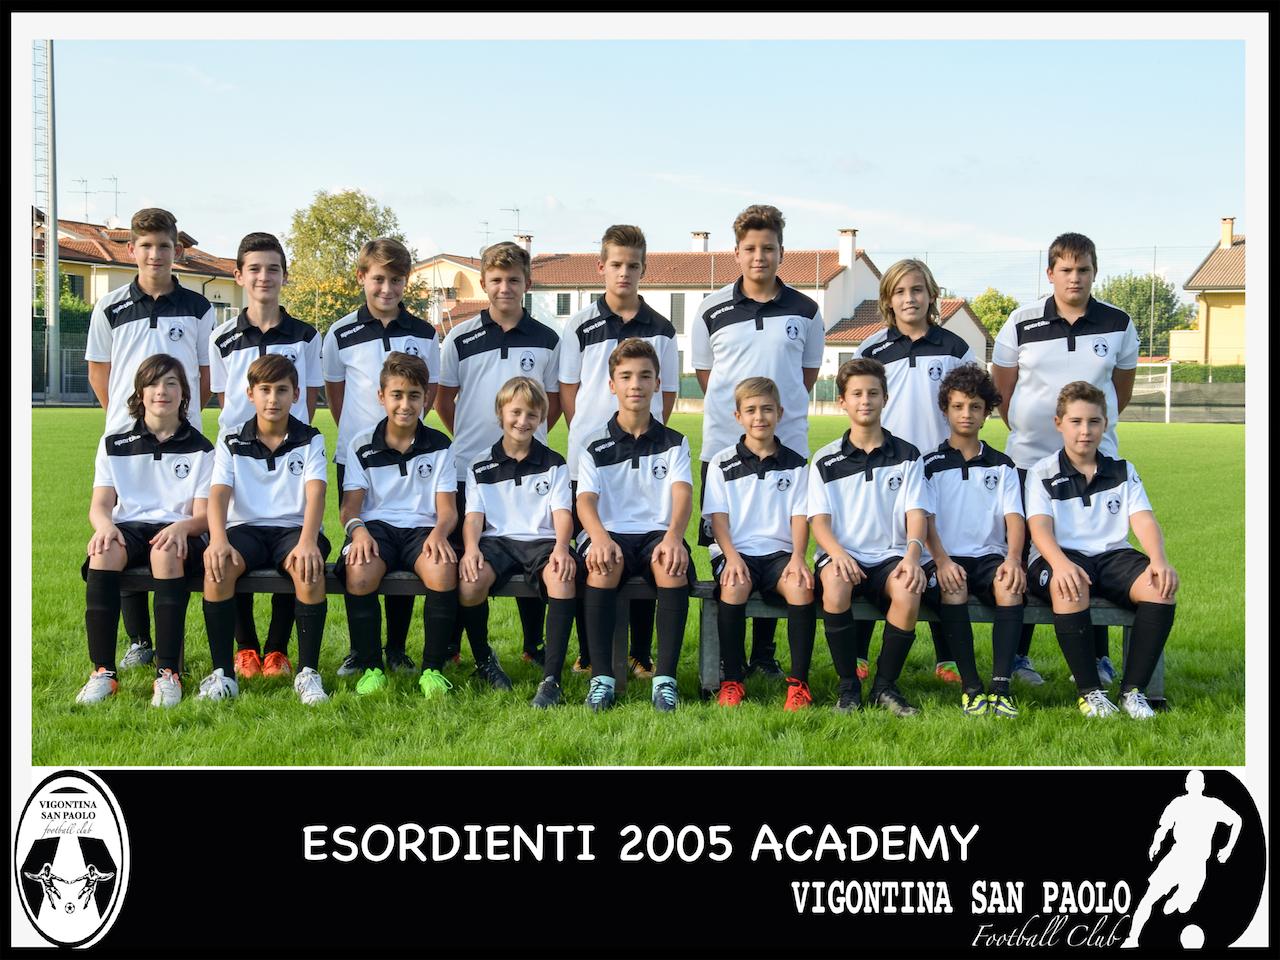 2005 Esordienti Academy